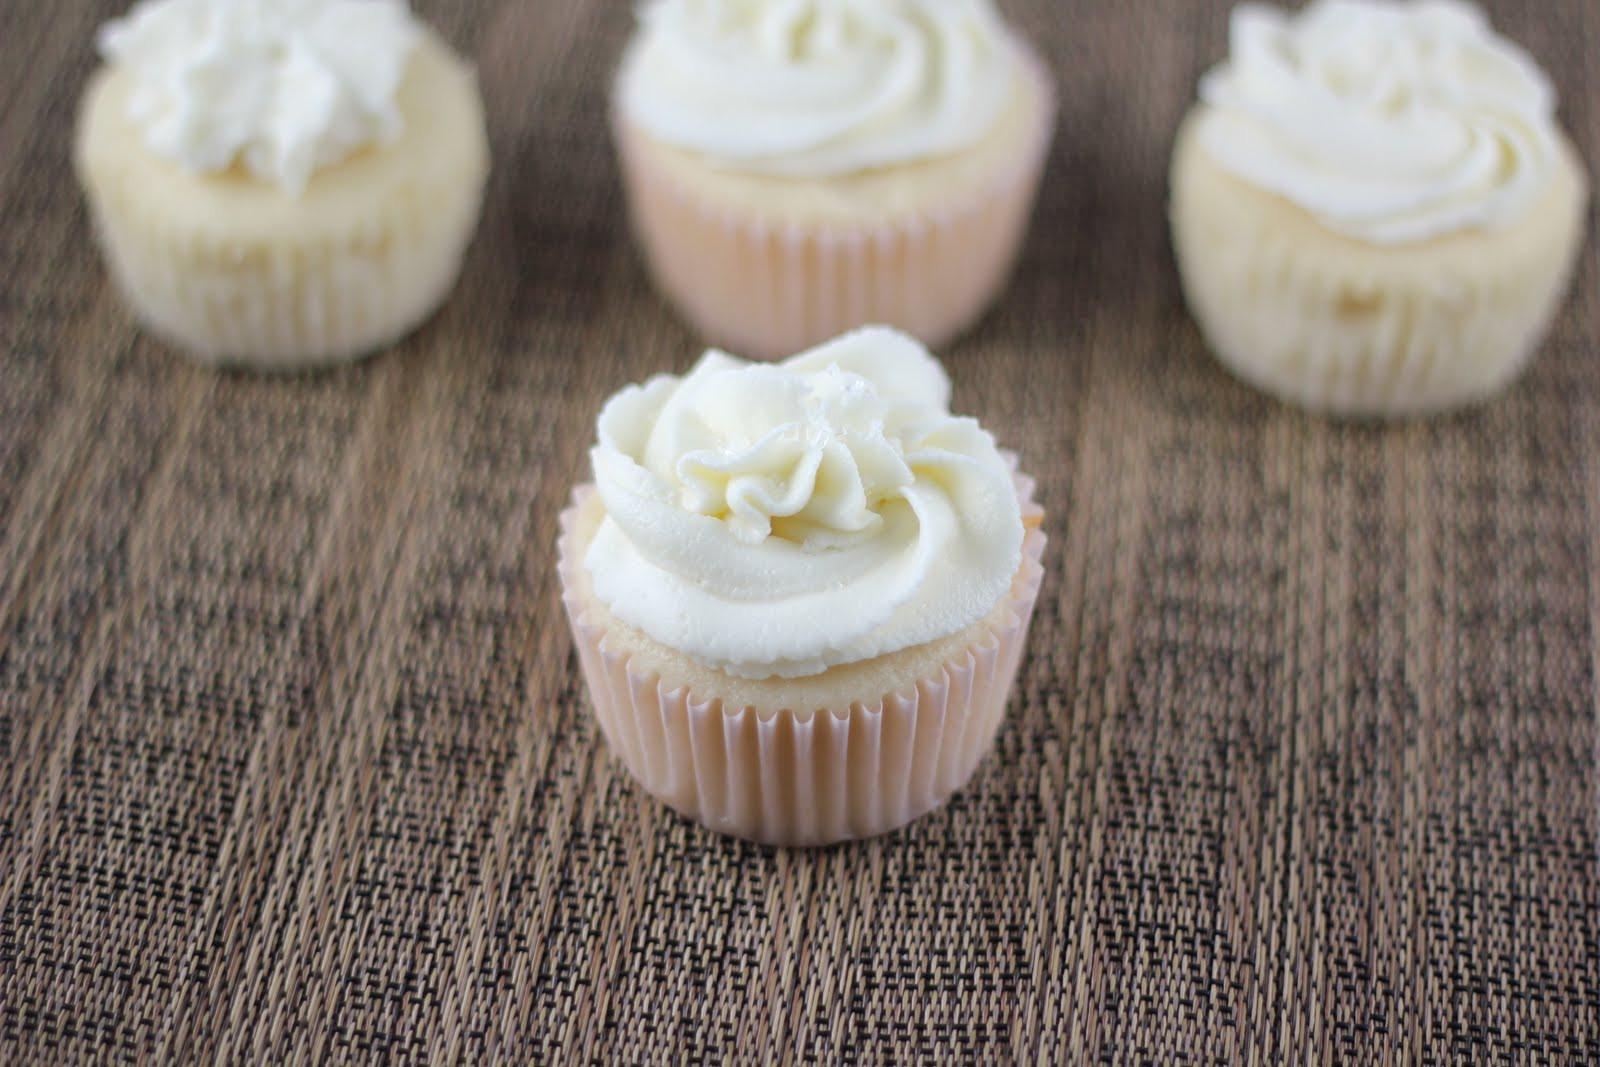 Wedding Cake Cupcake Recipe  White Wedding Cake Cupcakes A Zesty Bite